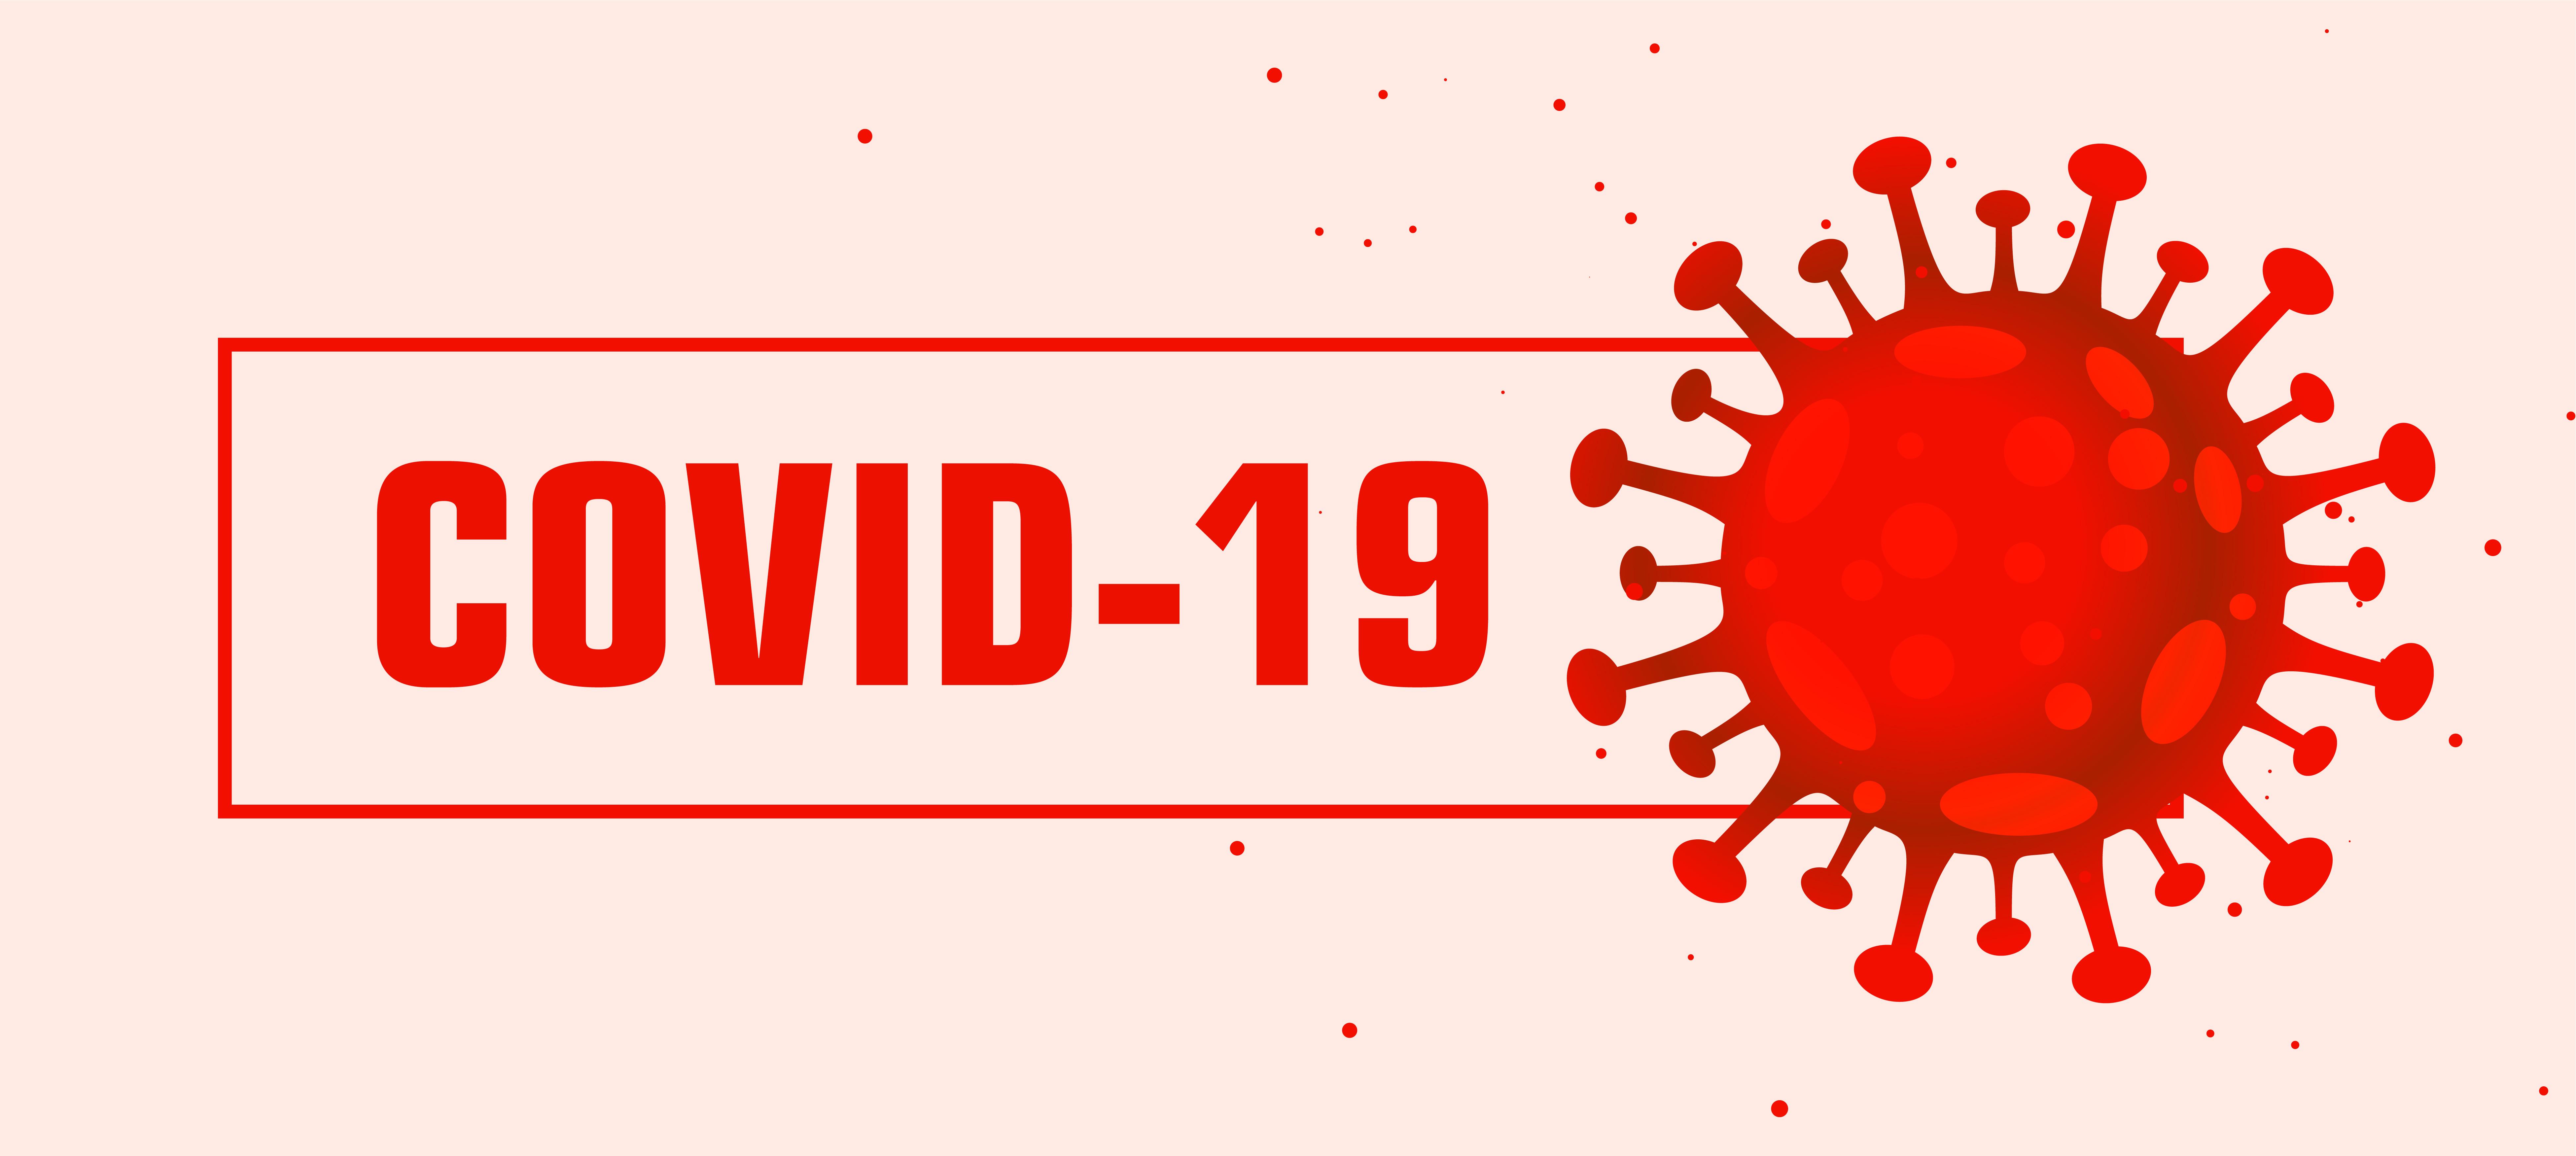 Coronavirus: Was ändert sich ab dem 2. November 2020?